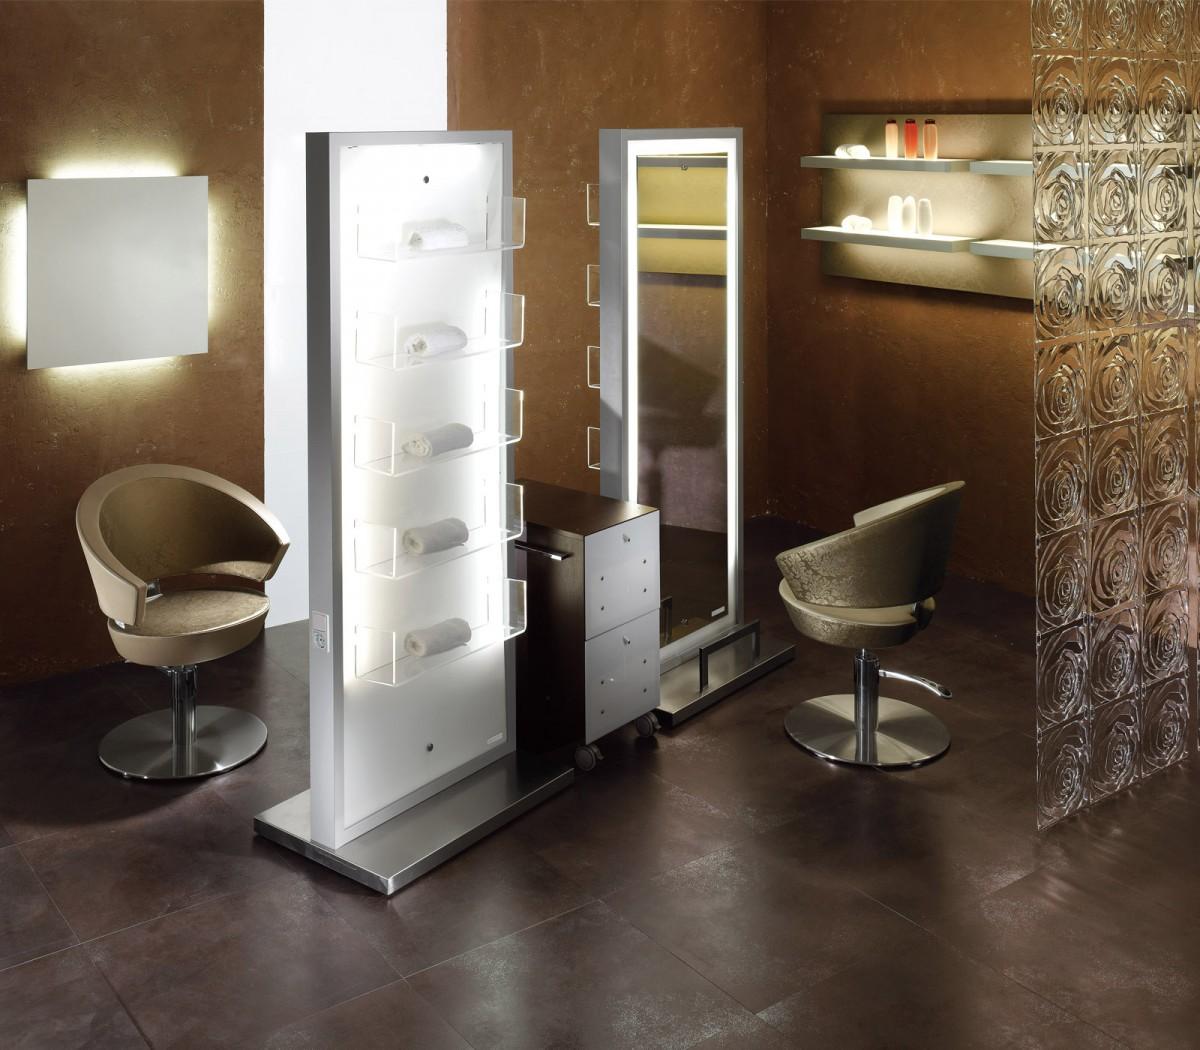 Salon ambience frisierplatz light spiegel regal cde salondesign - Spiegel salon ...